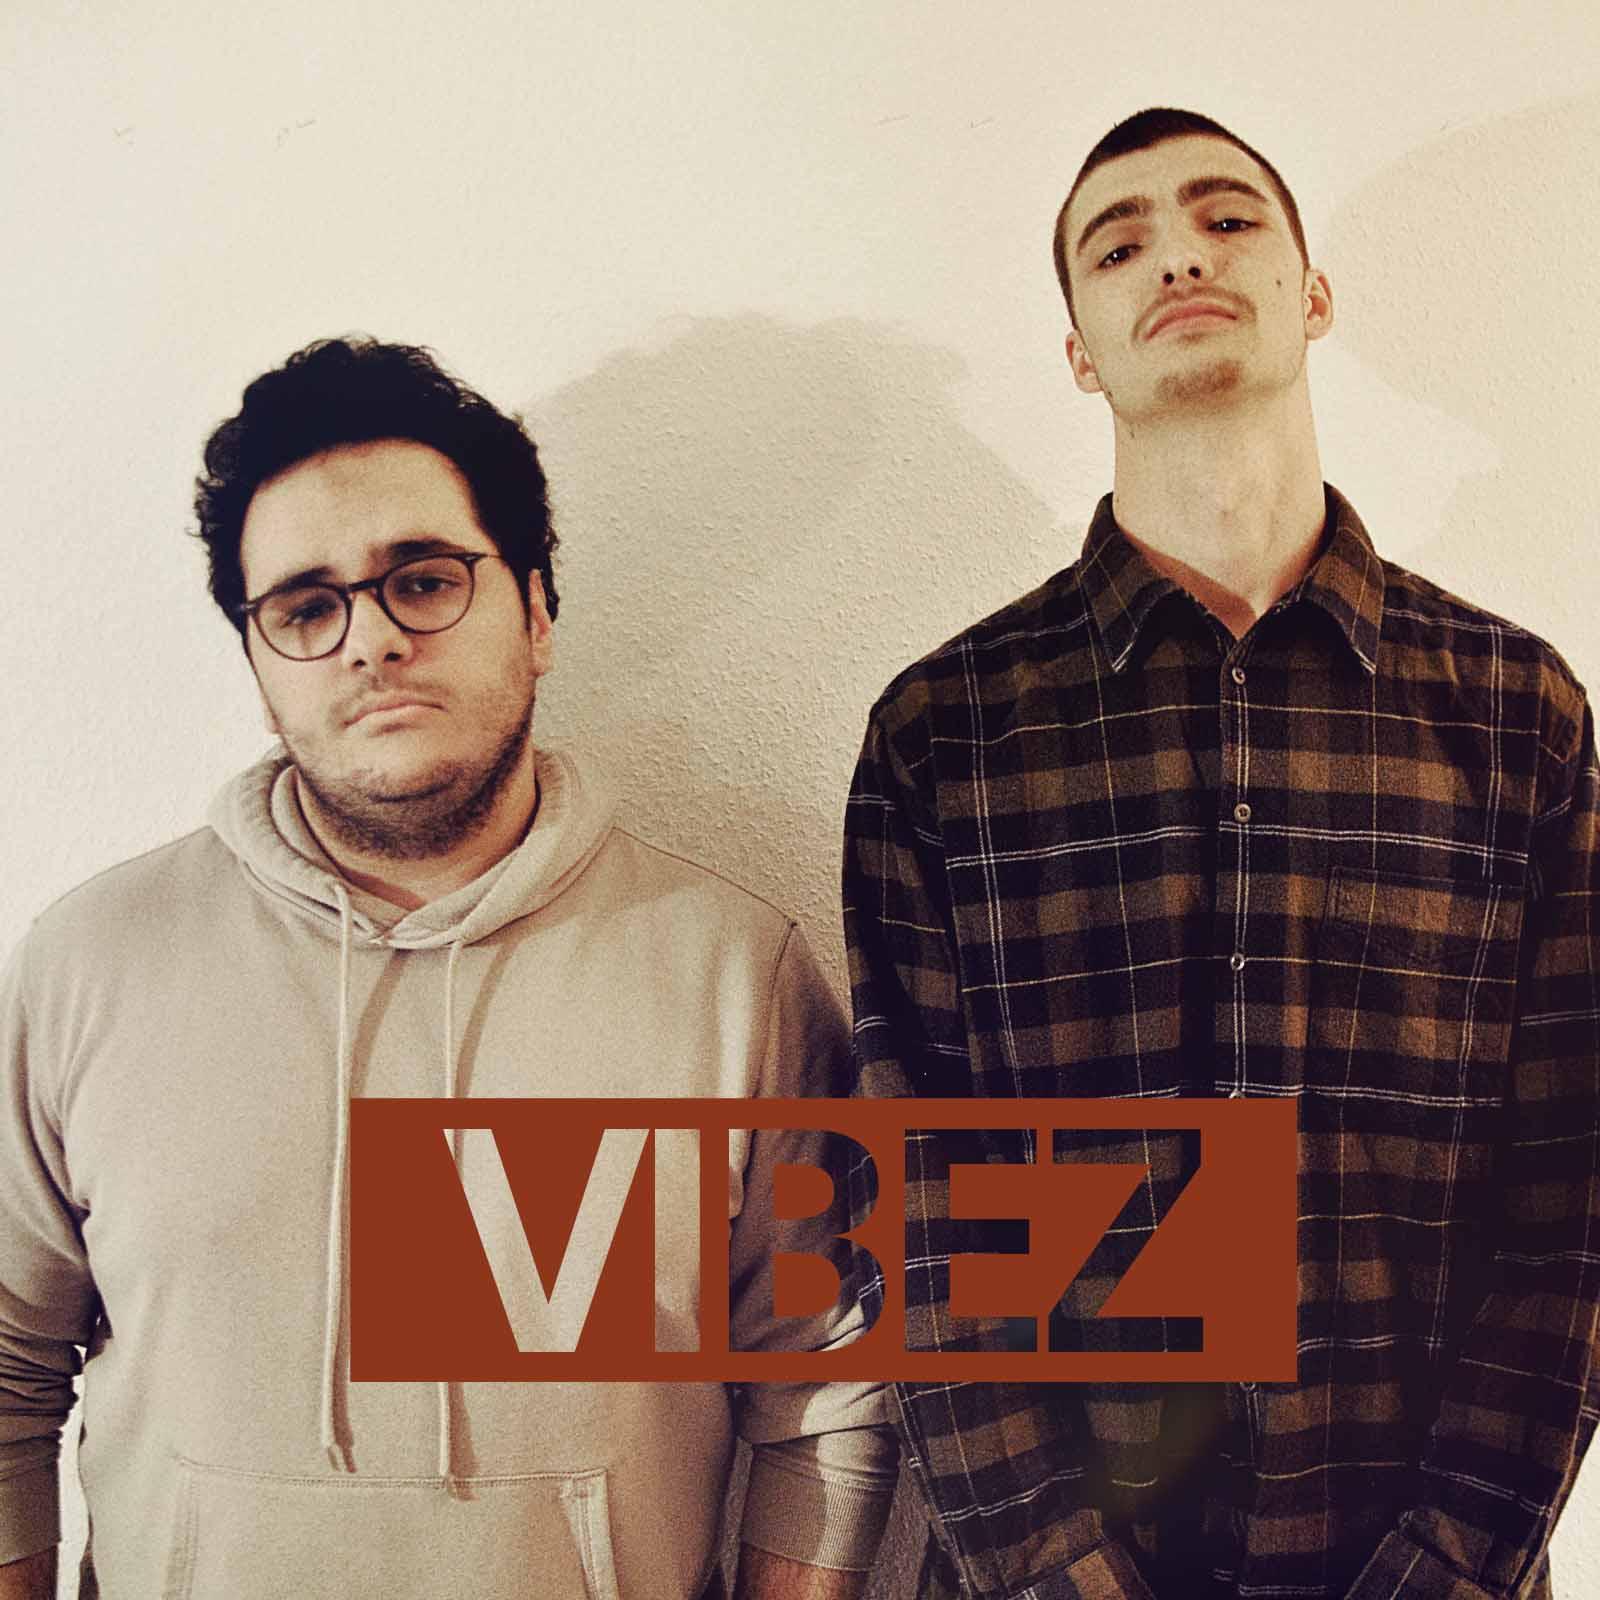 Upcoming: Jaaas x Lassal - VIBEZ (Video)